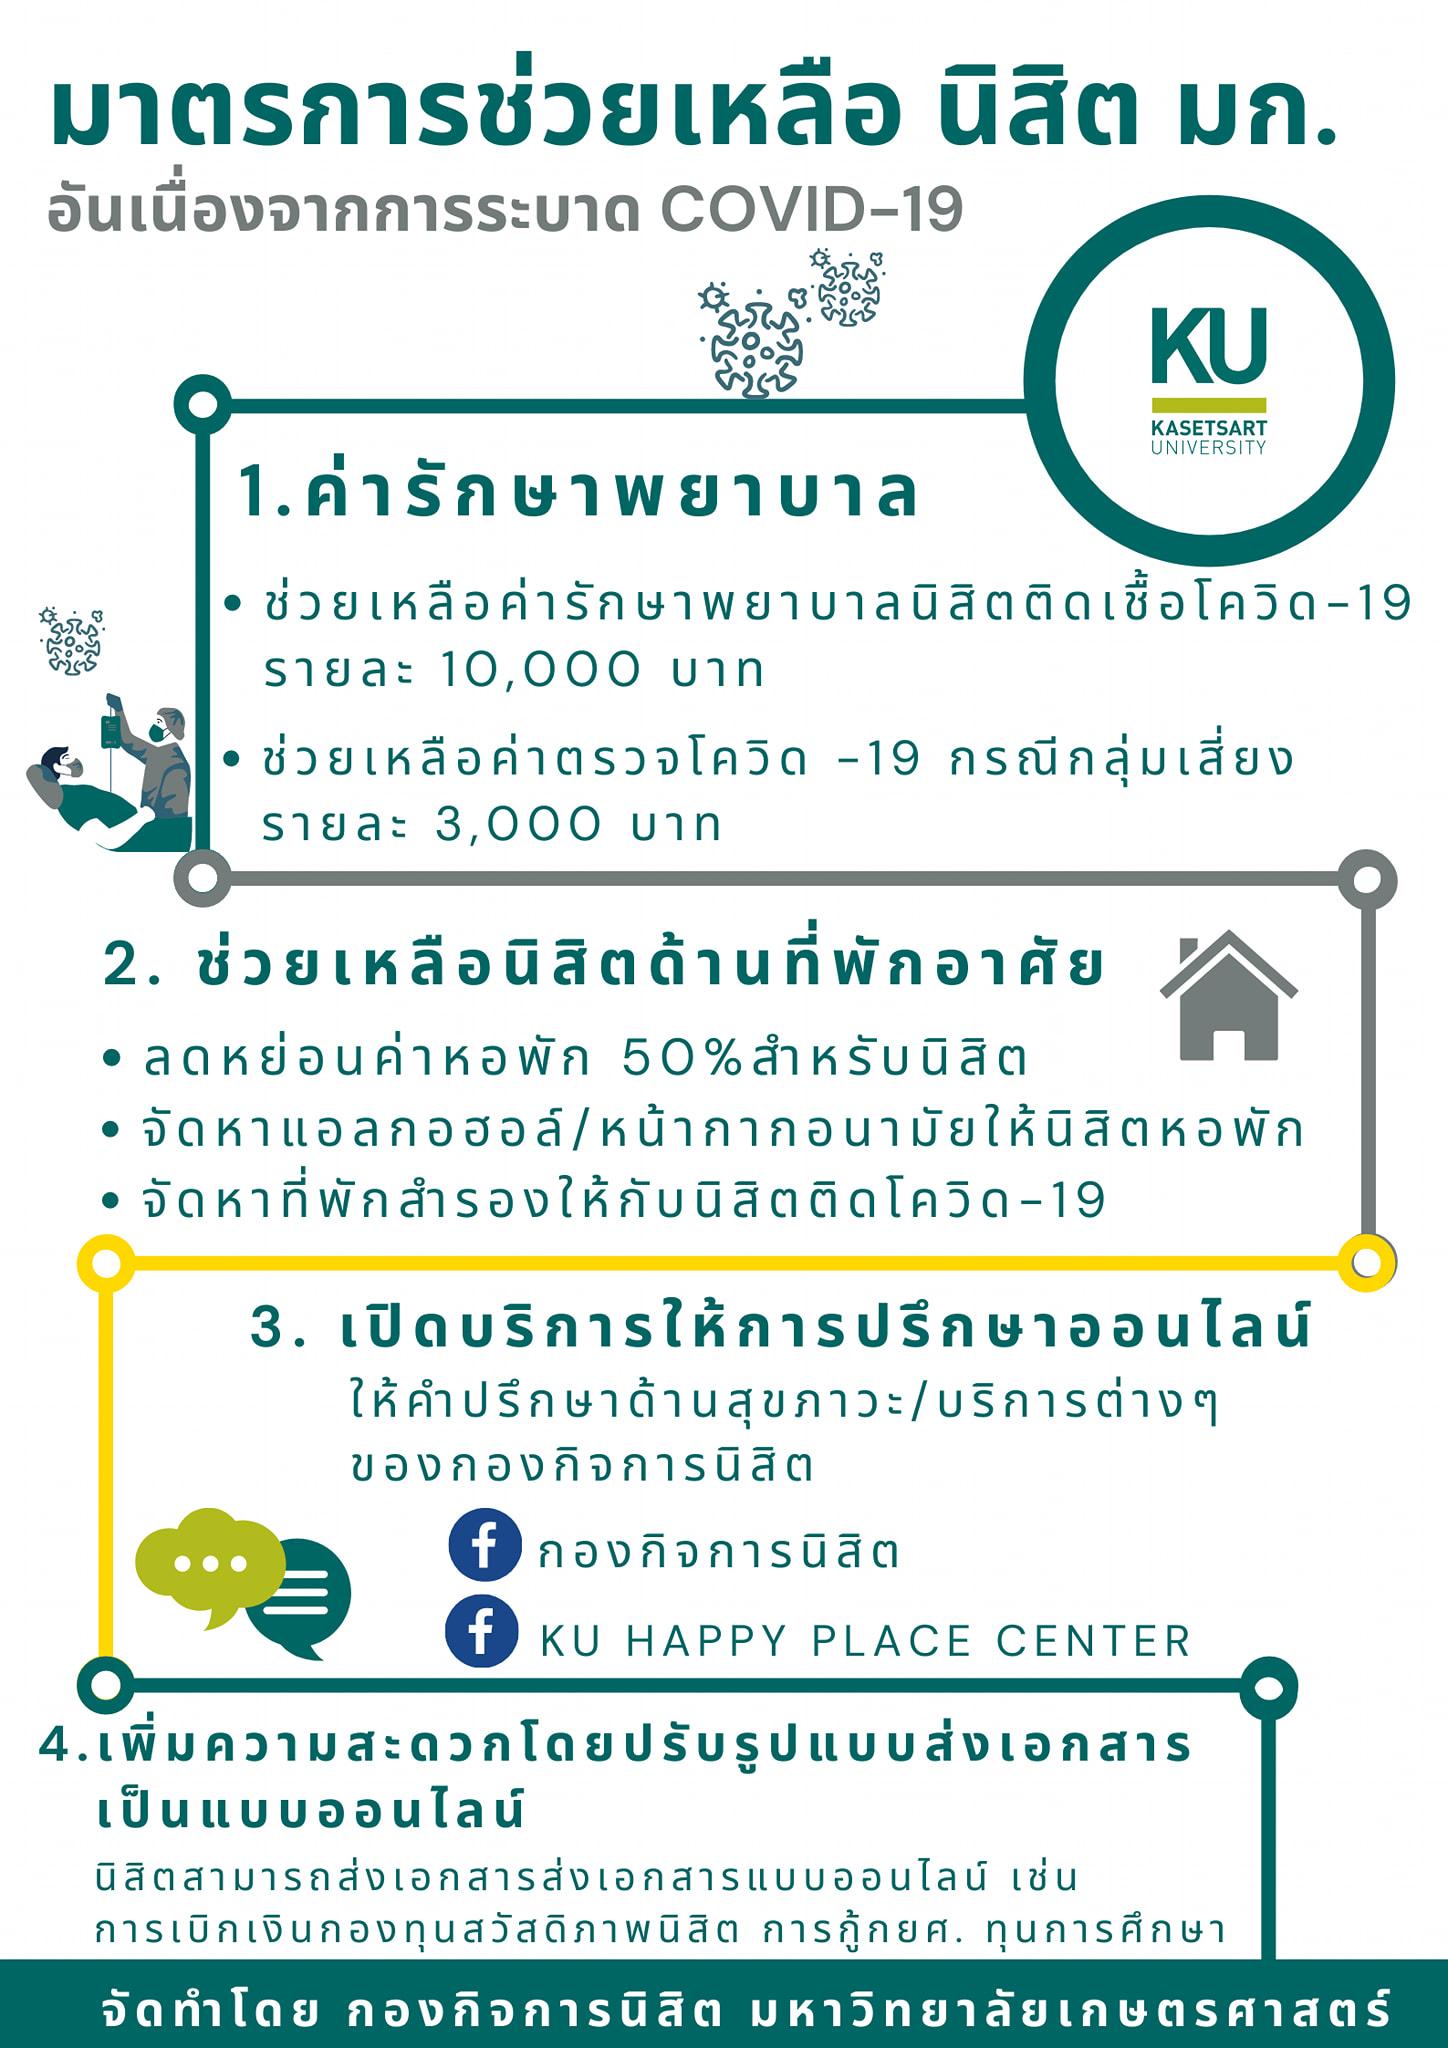 Kasetsart University - มหาวิทยาลัยเกษตรศาสตร์